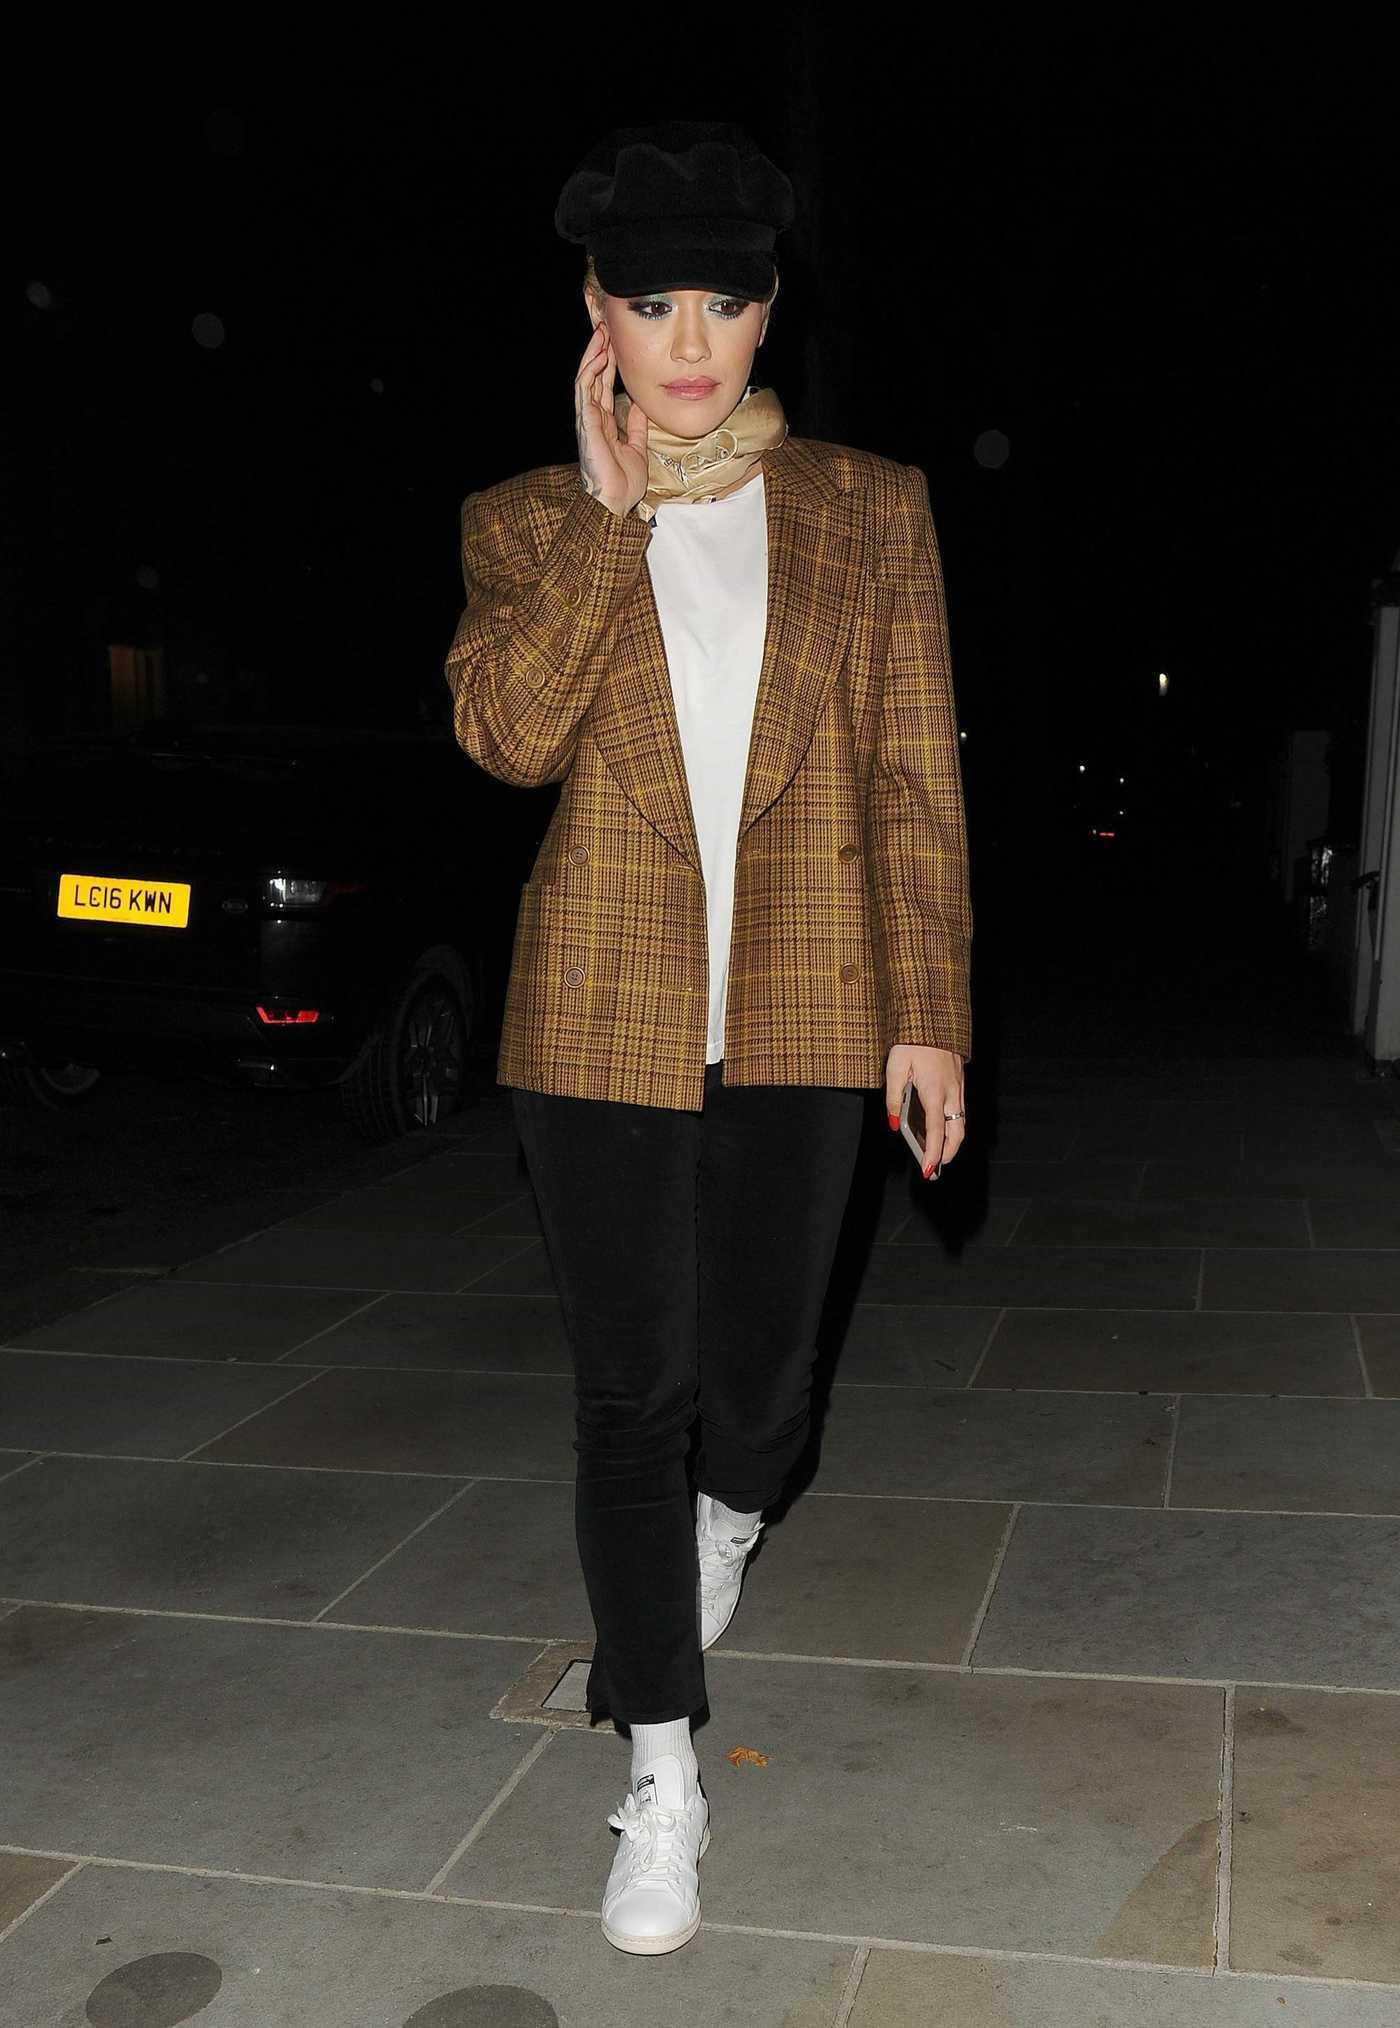 Rita Ora in a Black Cap Leaves the Television Centre in London 12/12/2018